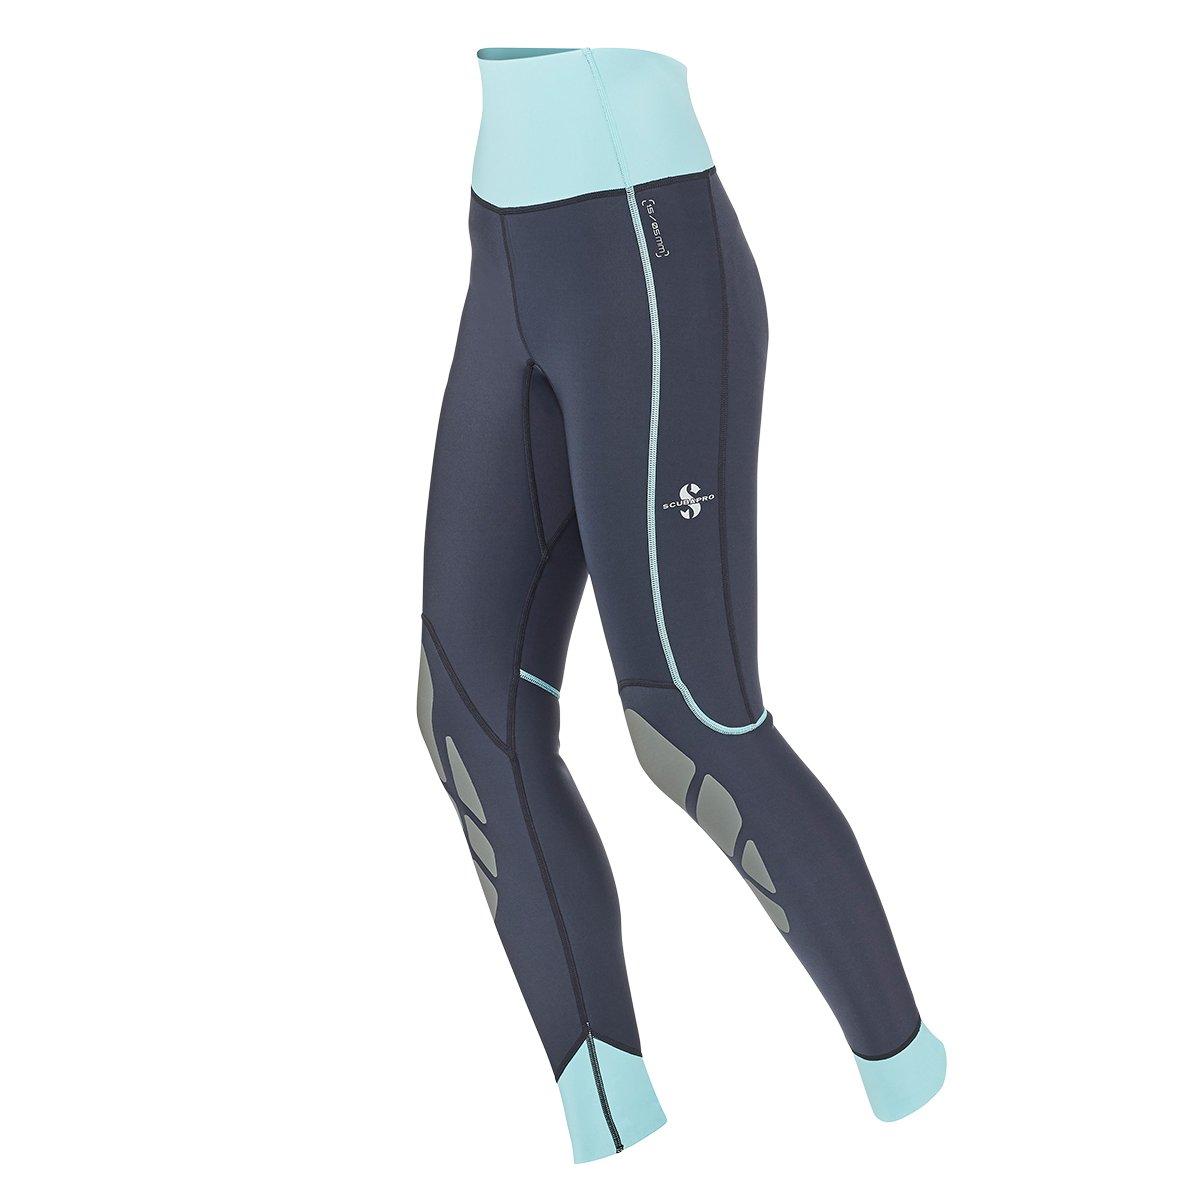 Everflex 1.5 Legging Women's